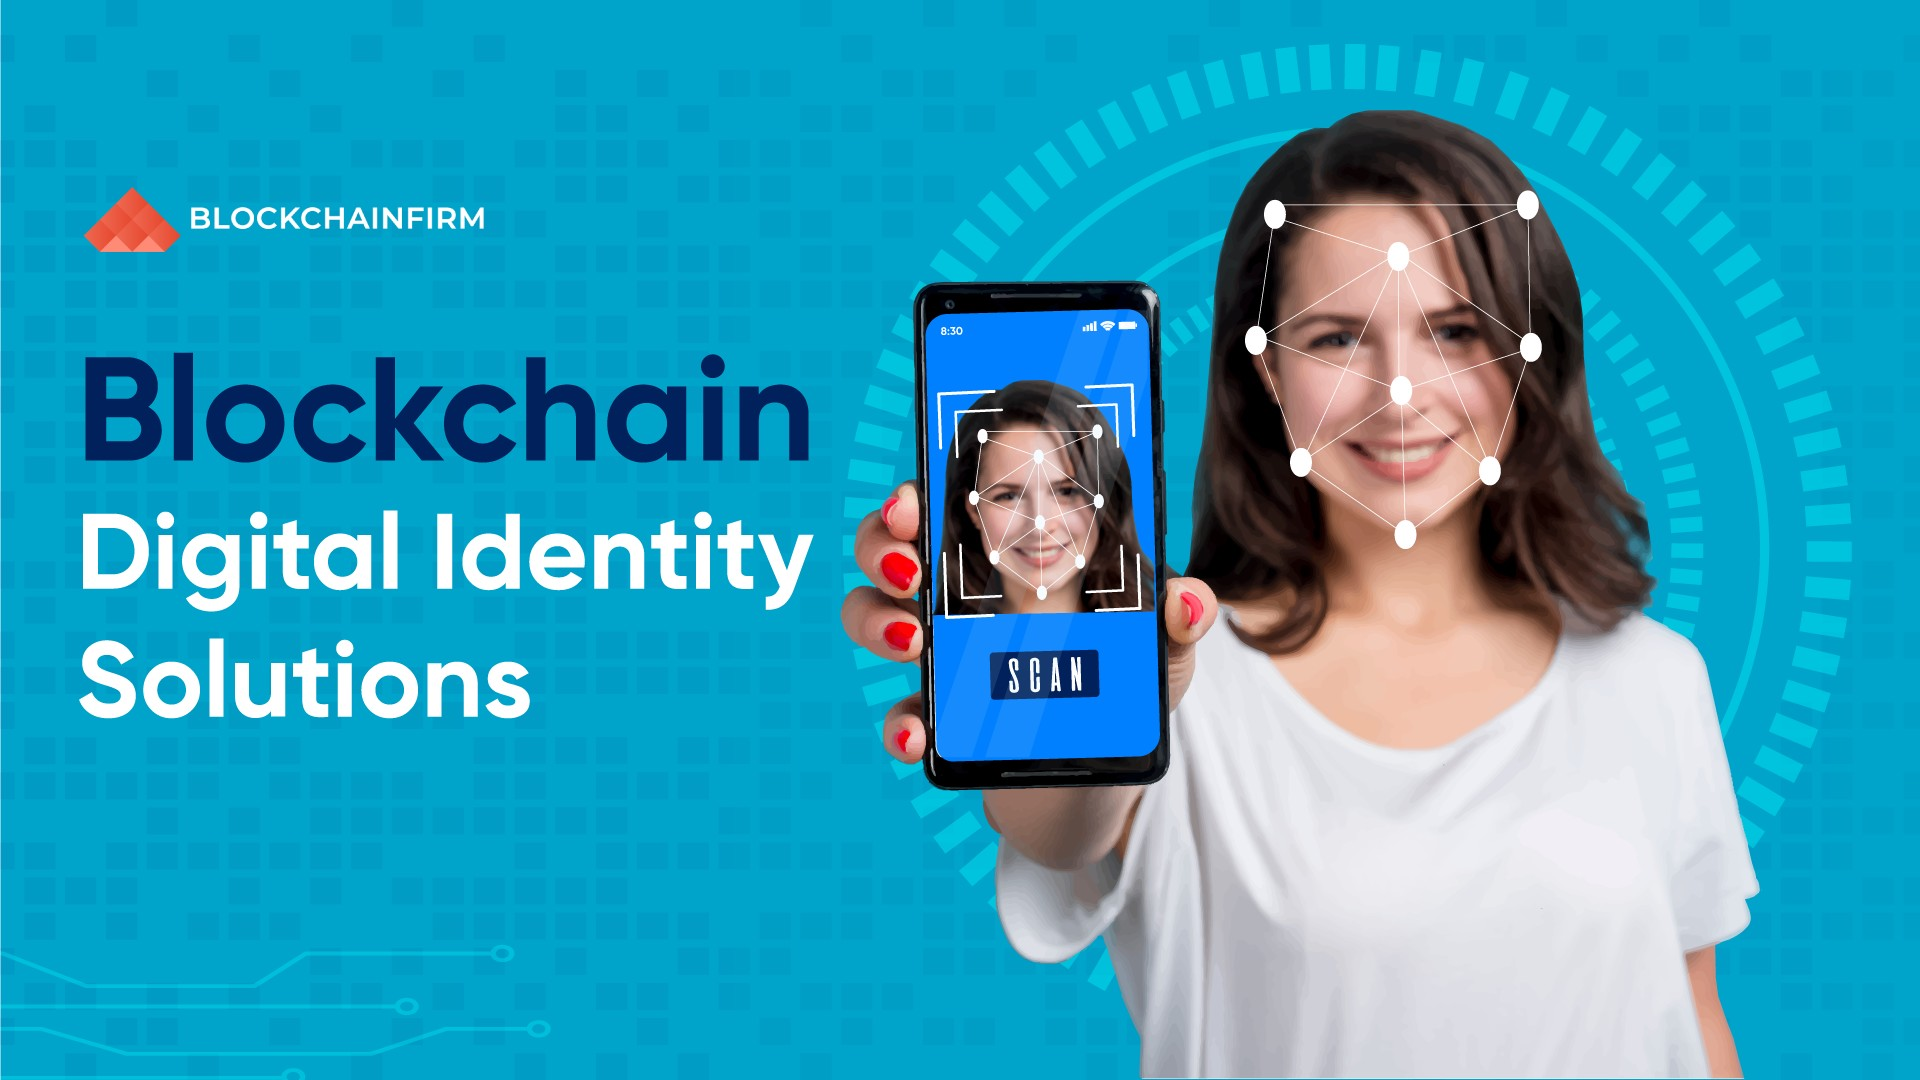 Blockchain Digital Identity Solutions